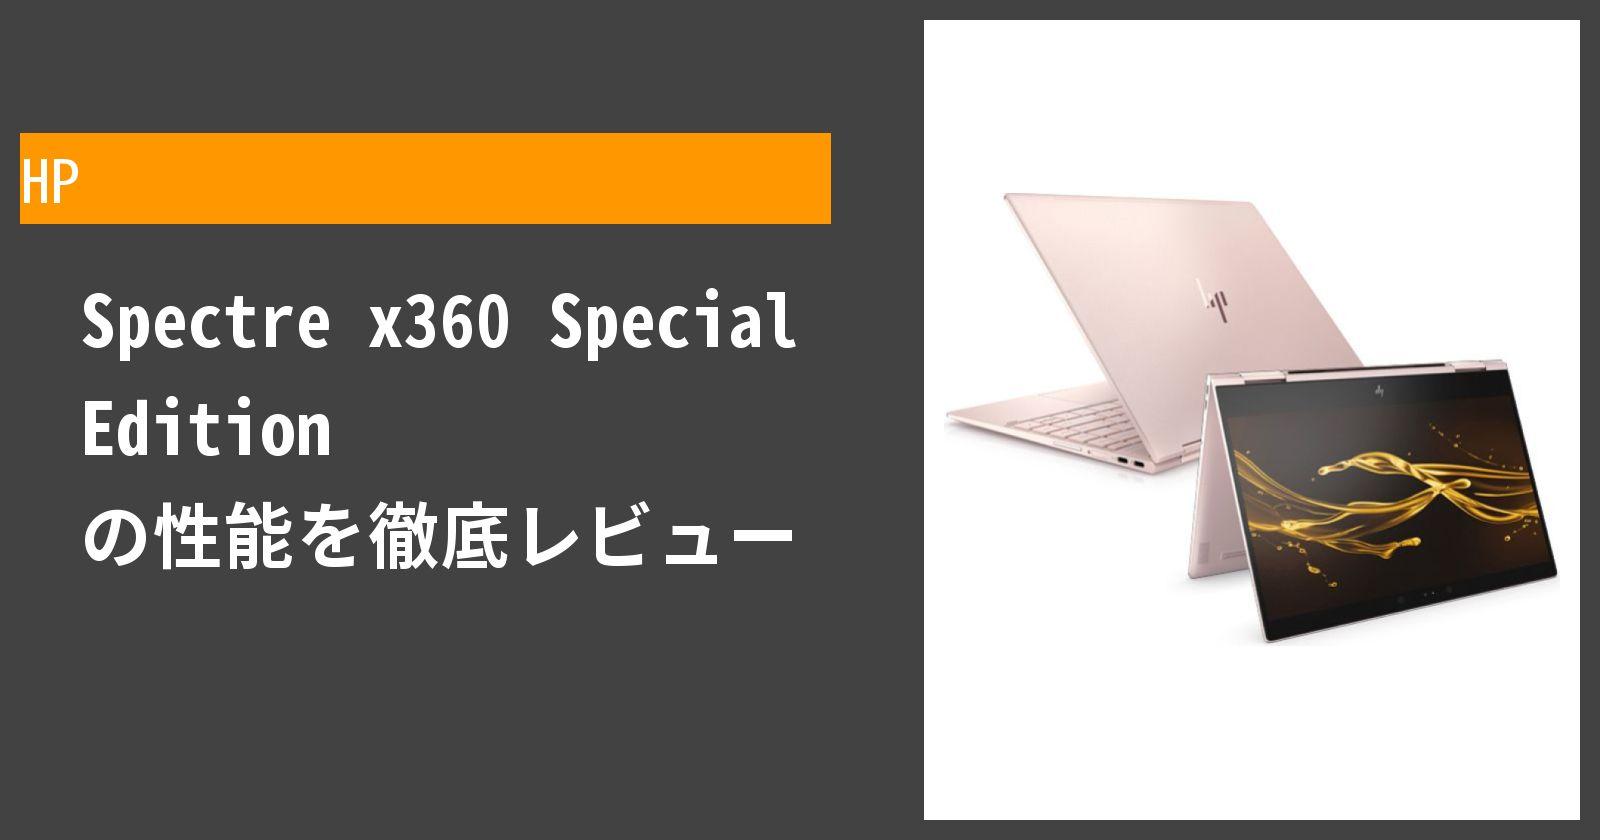 Spectre x360 Special Edition の性能を徹底レビュー